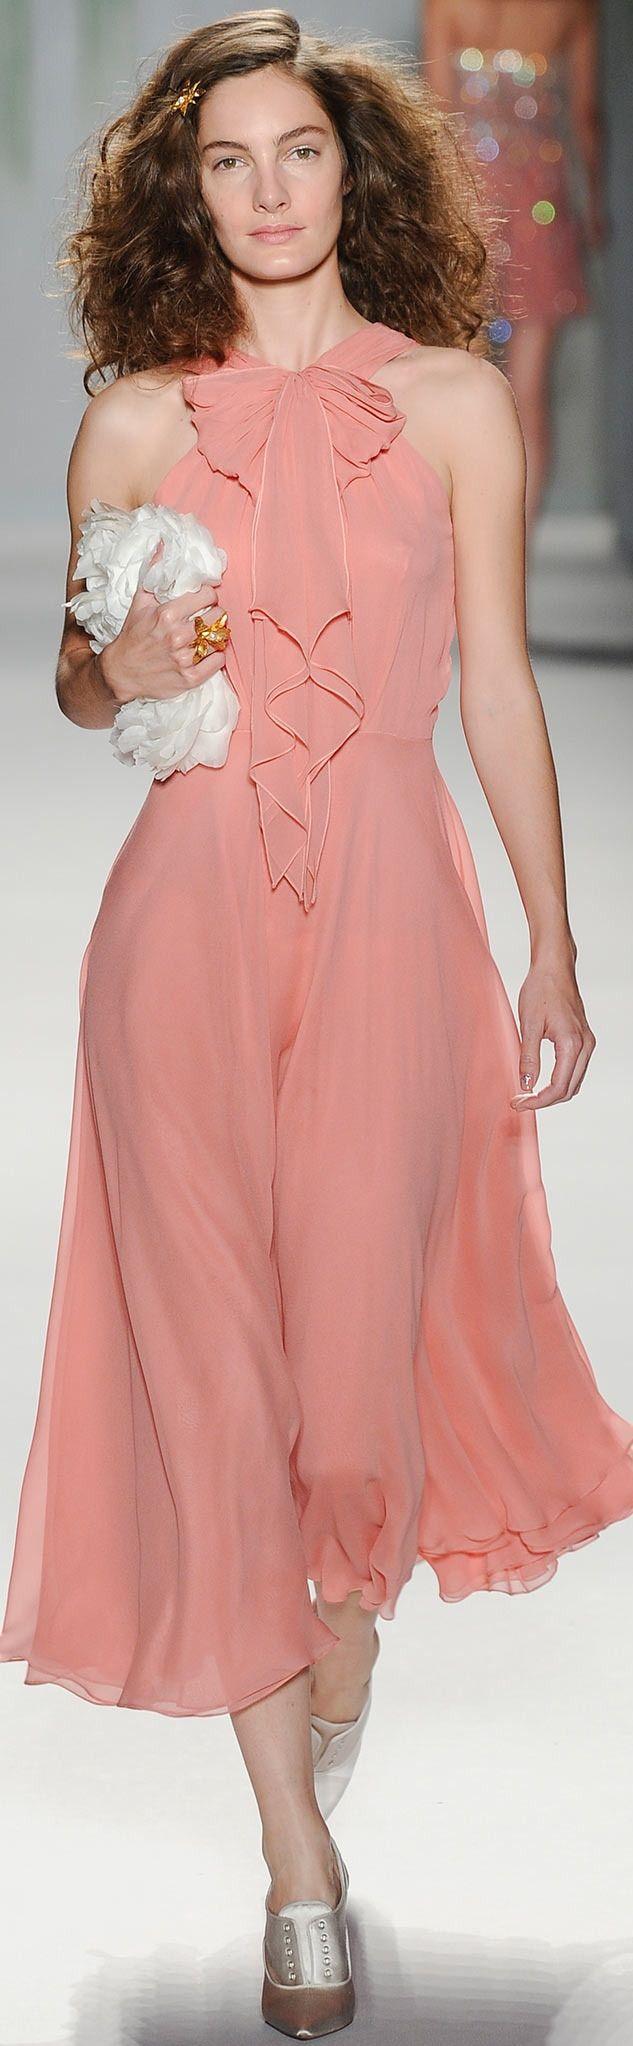 Jenny Packham Spring 2014 LBV - Peach Blush ~ NanangCe ~ Clásico ~ Classique ~ Sweetinspiration ~